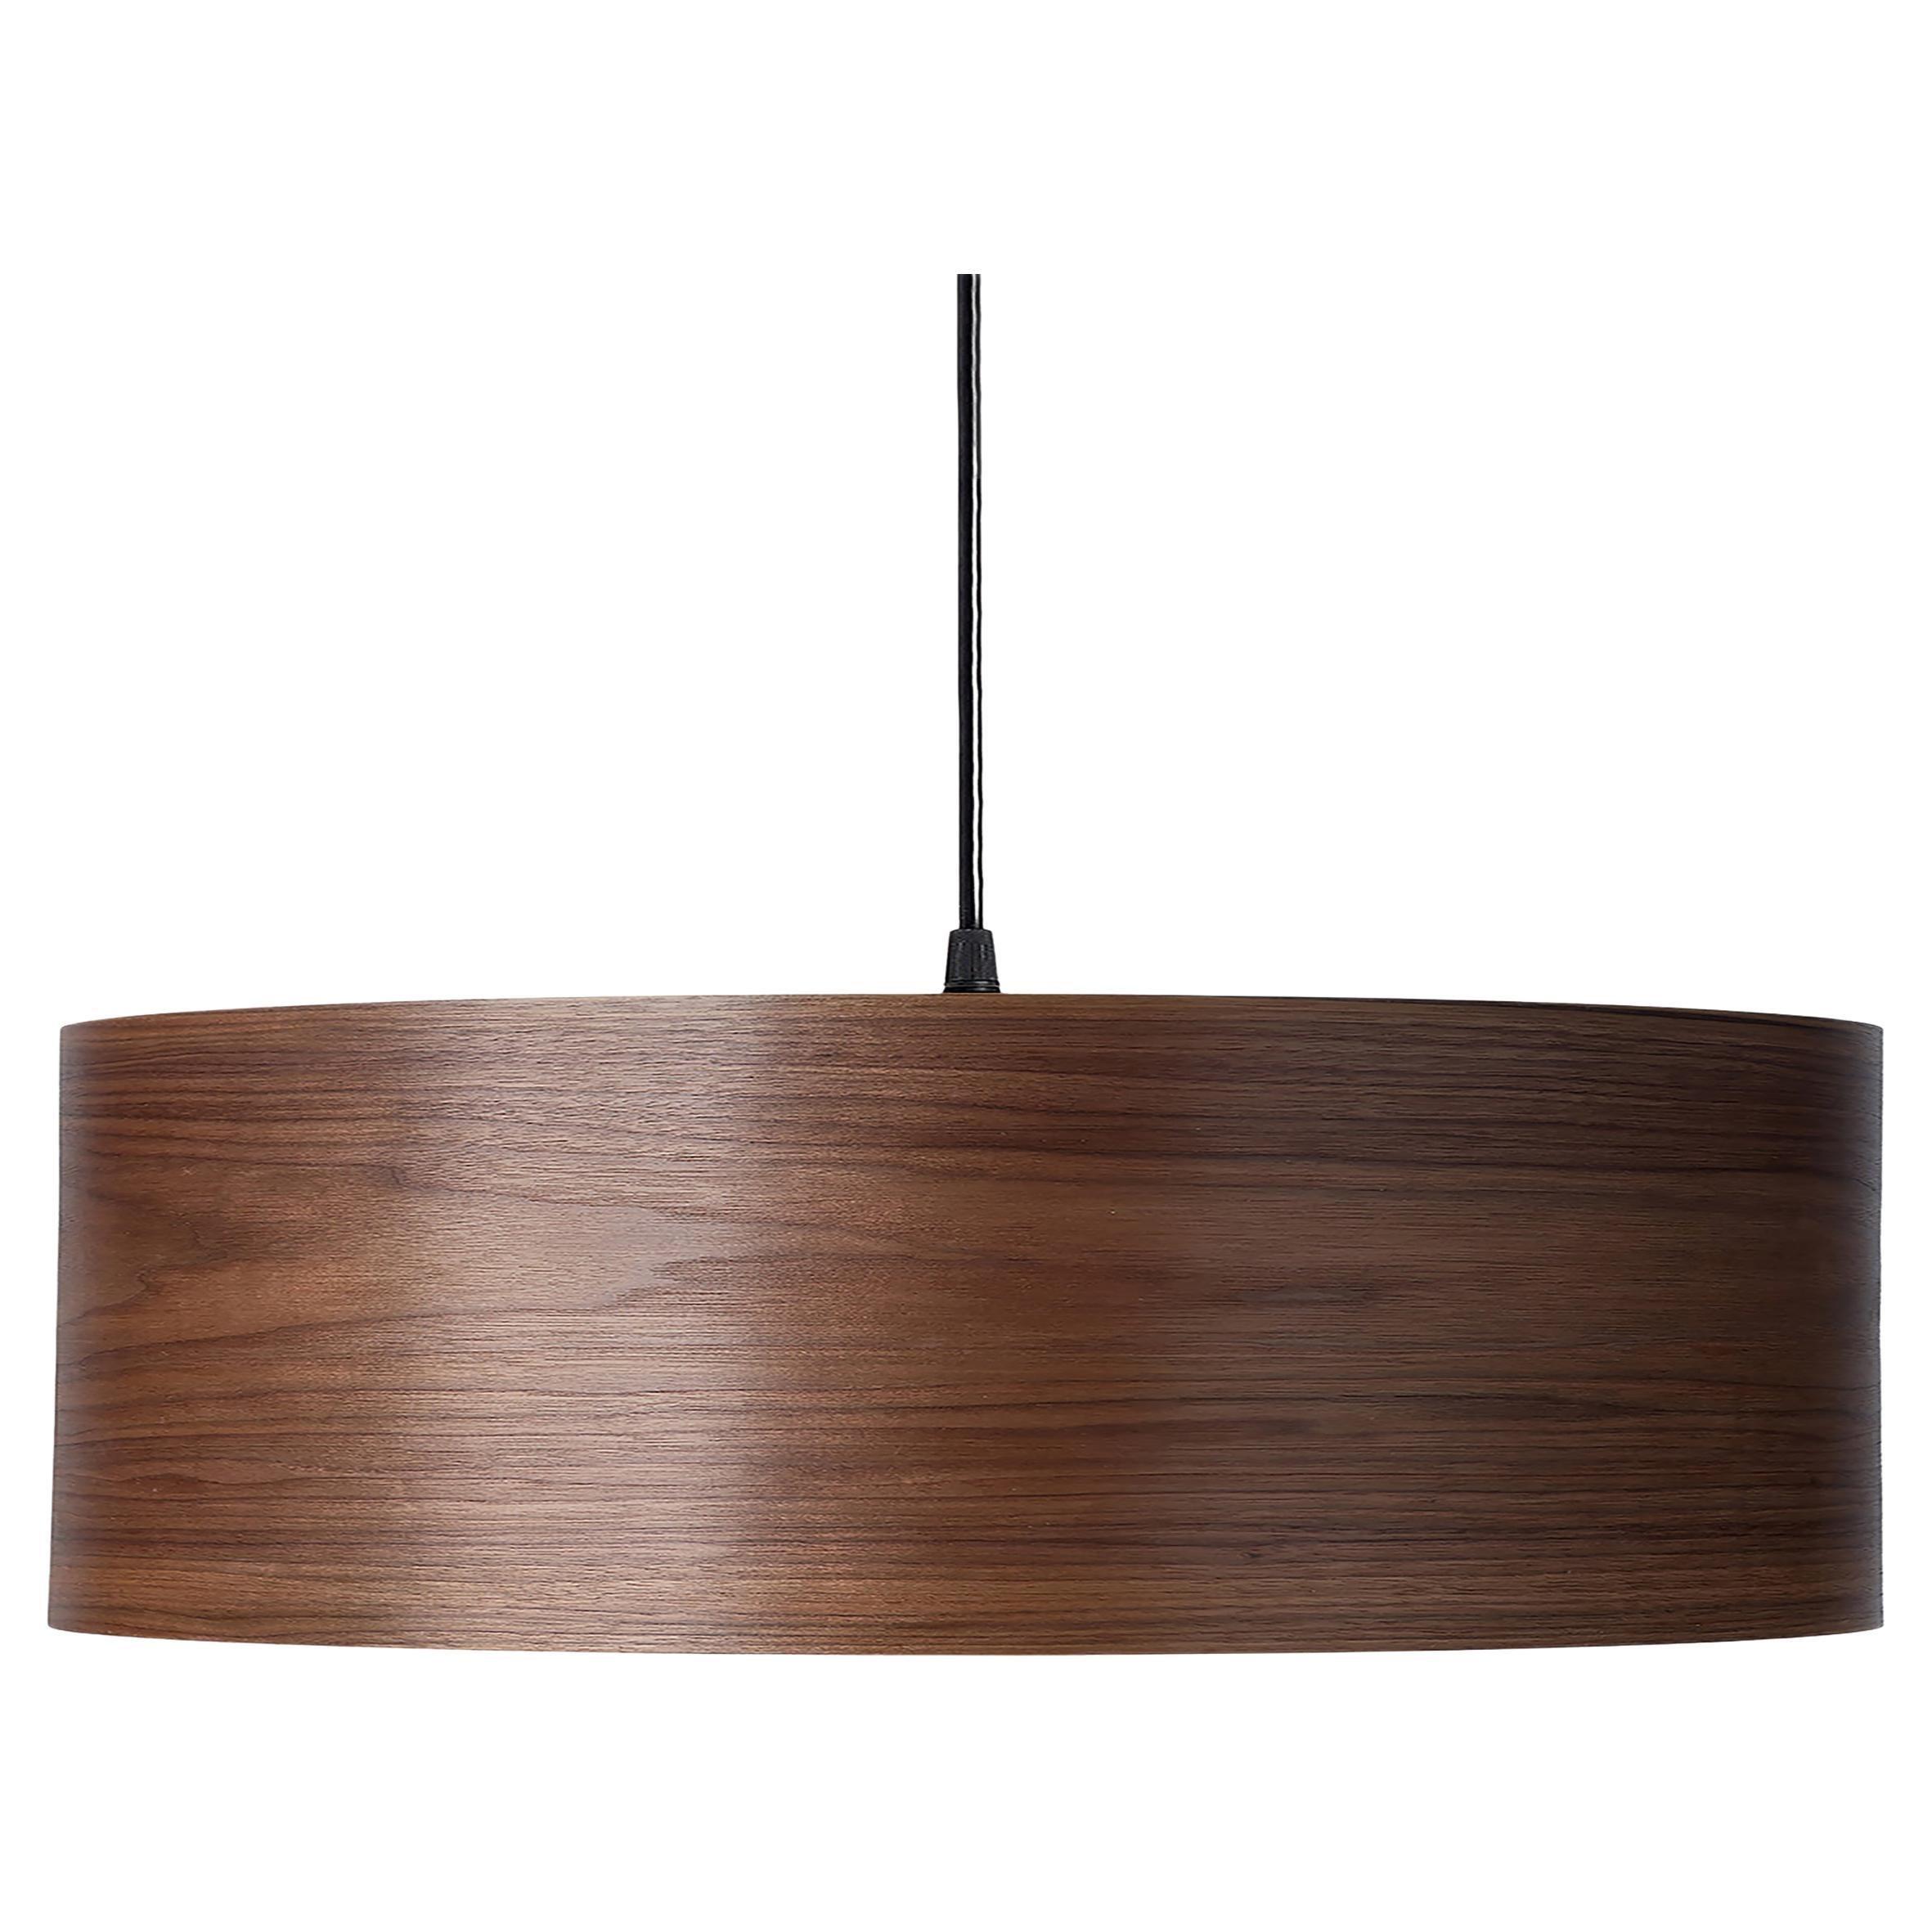 "Mid-Century Modern Walnut Wood 30"" Drum Pendant"